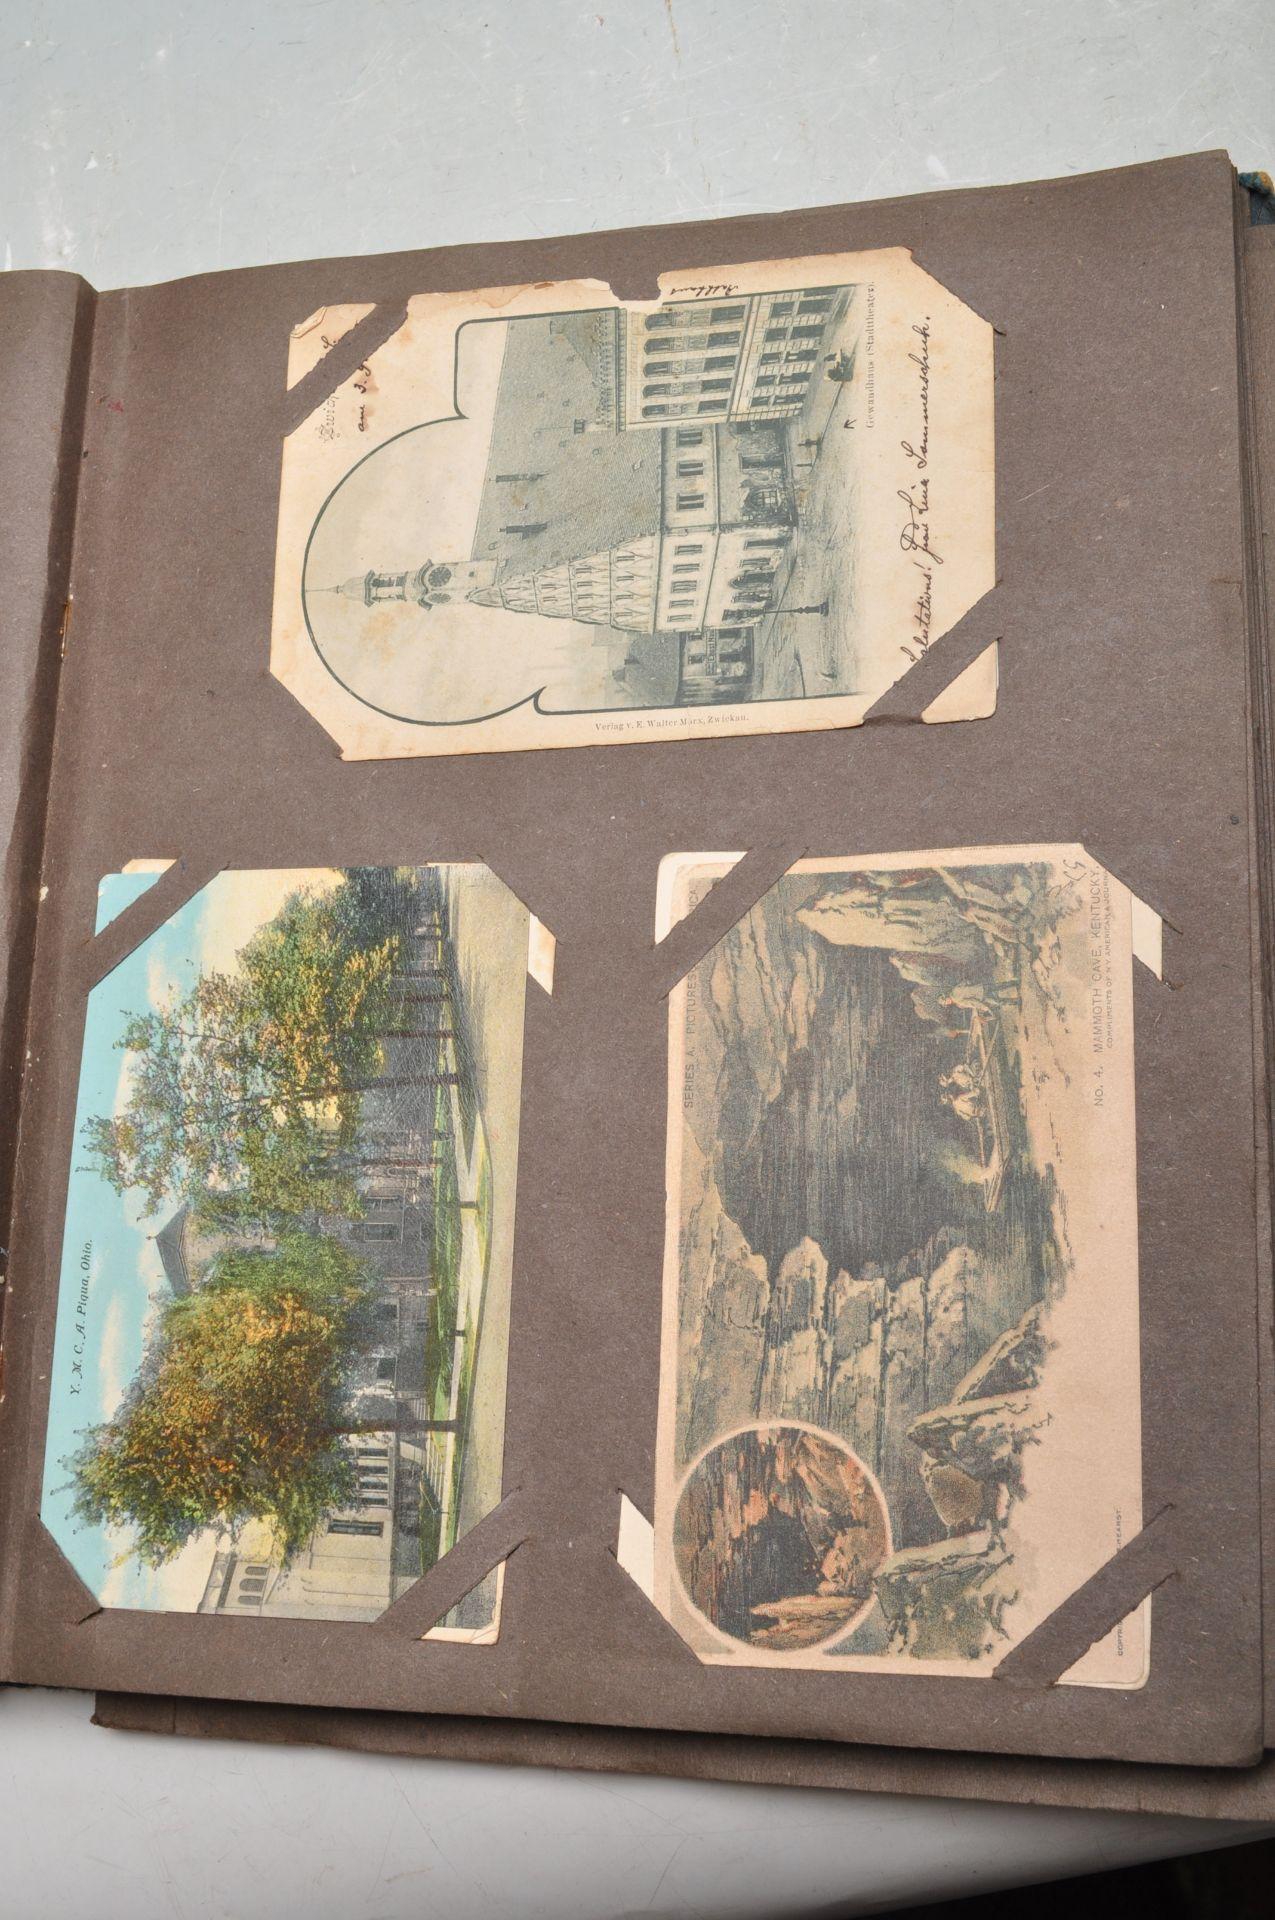 ALBUM OF FOREIGN POSTCARDS - ALL CIRCA WW1 PERIOD - Bild 13 aus 23